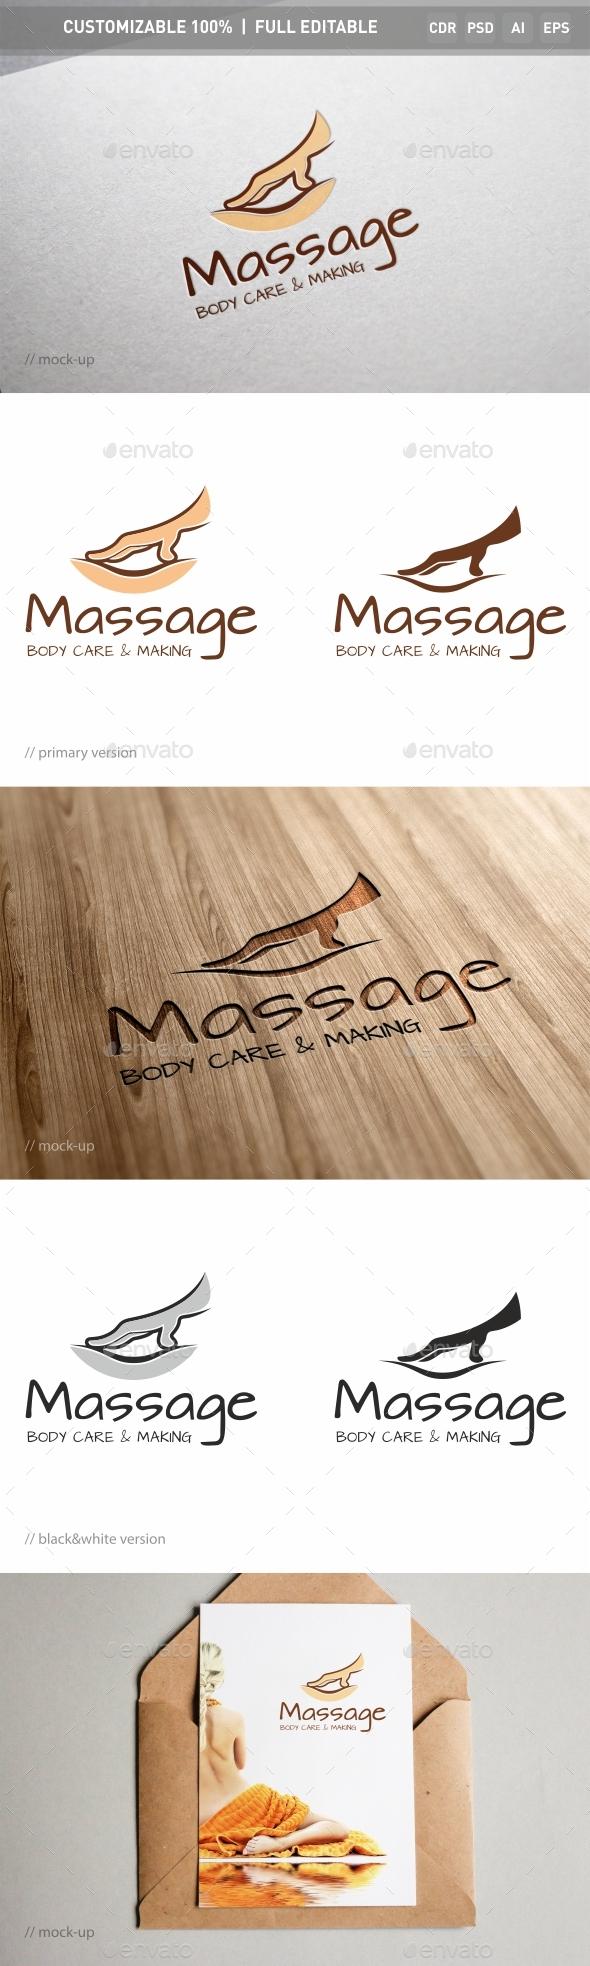 Massage Logo Template